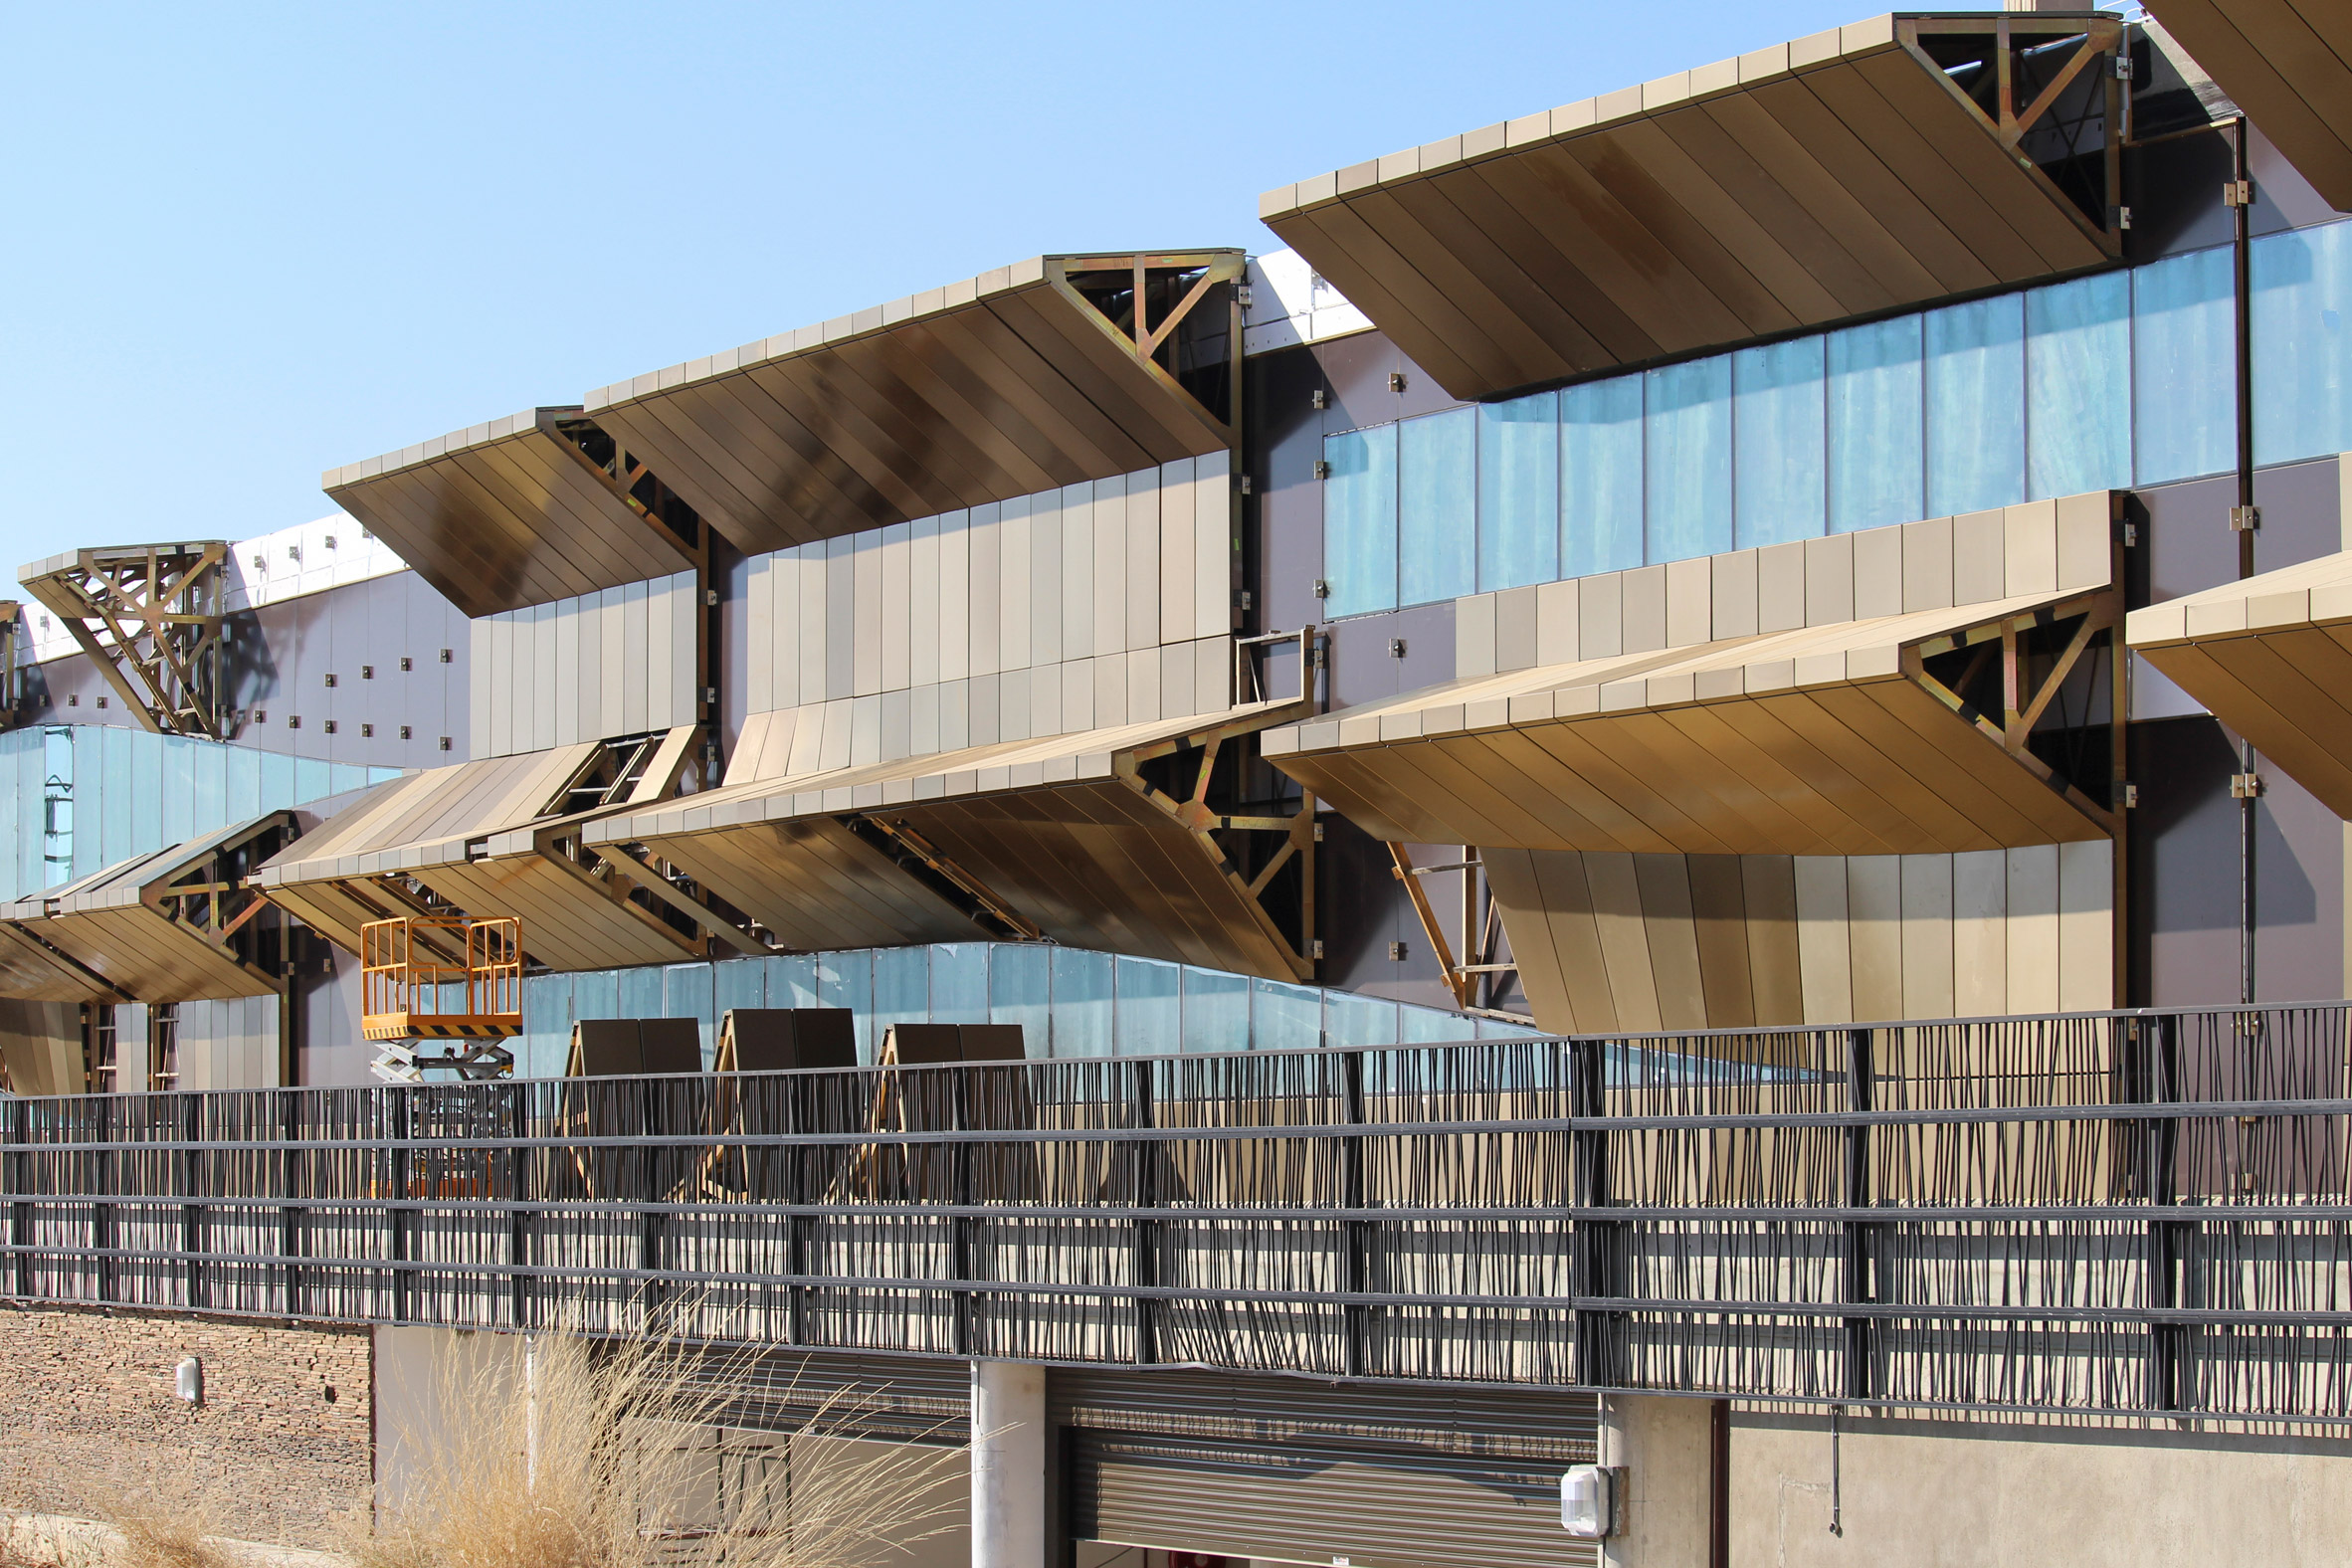 Botswana Innovation Hub and HIV Research Lab, Gaborone,Botswana, by SHoP Architects